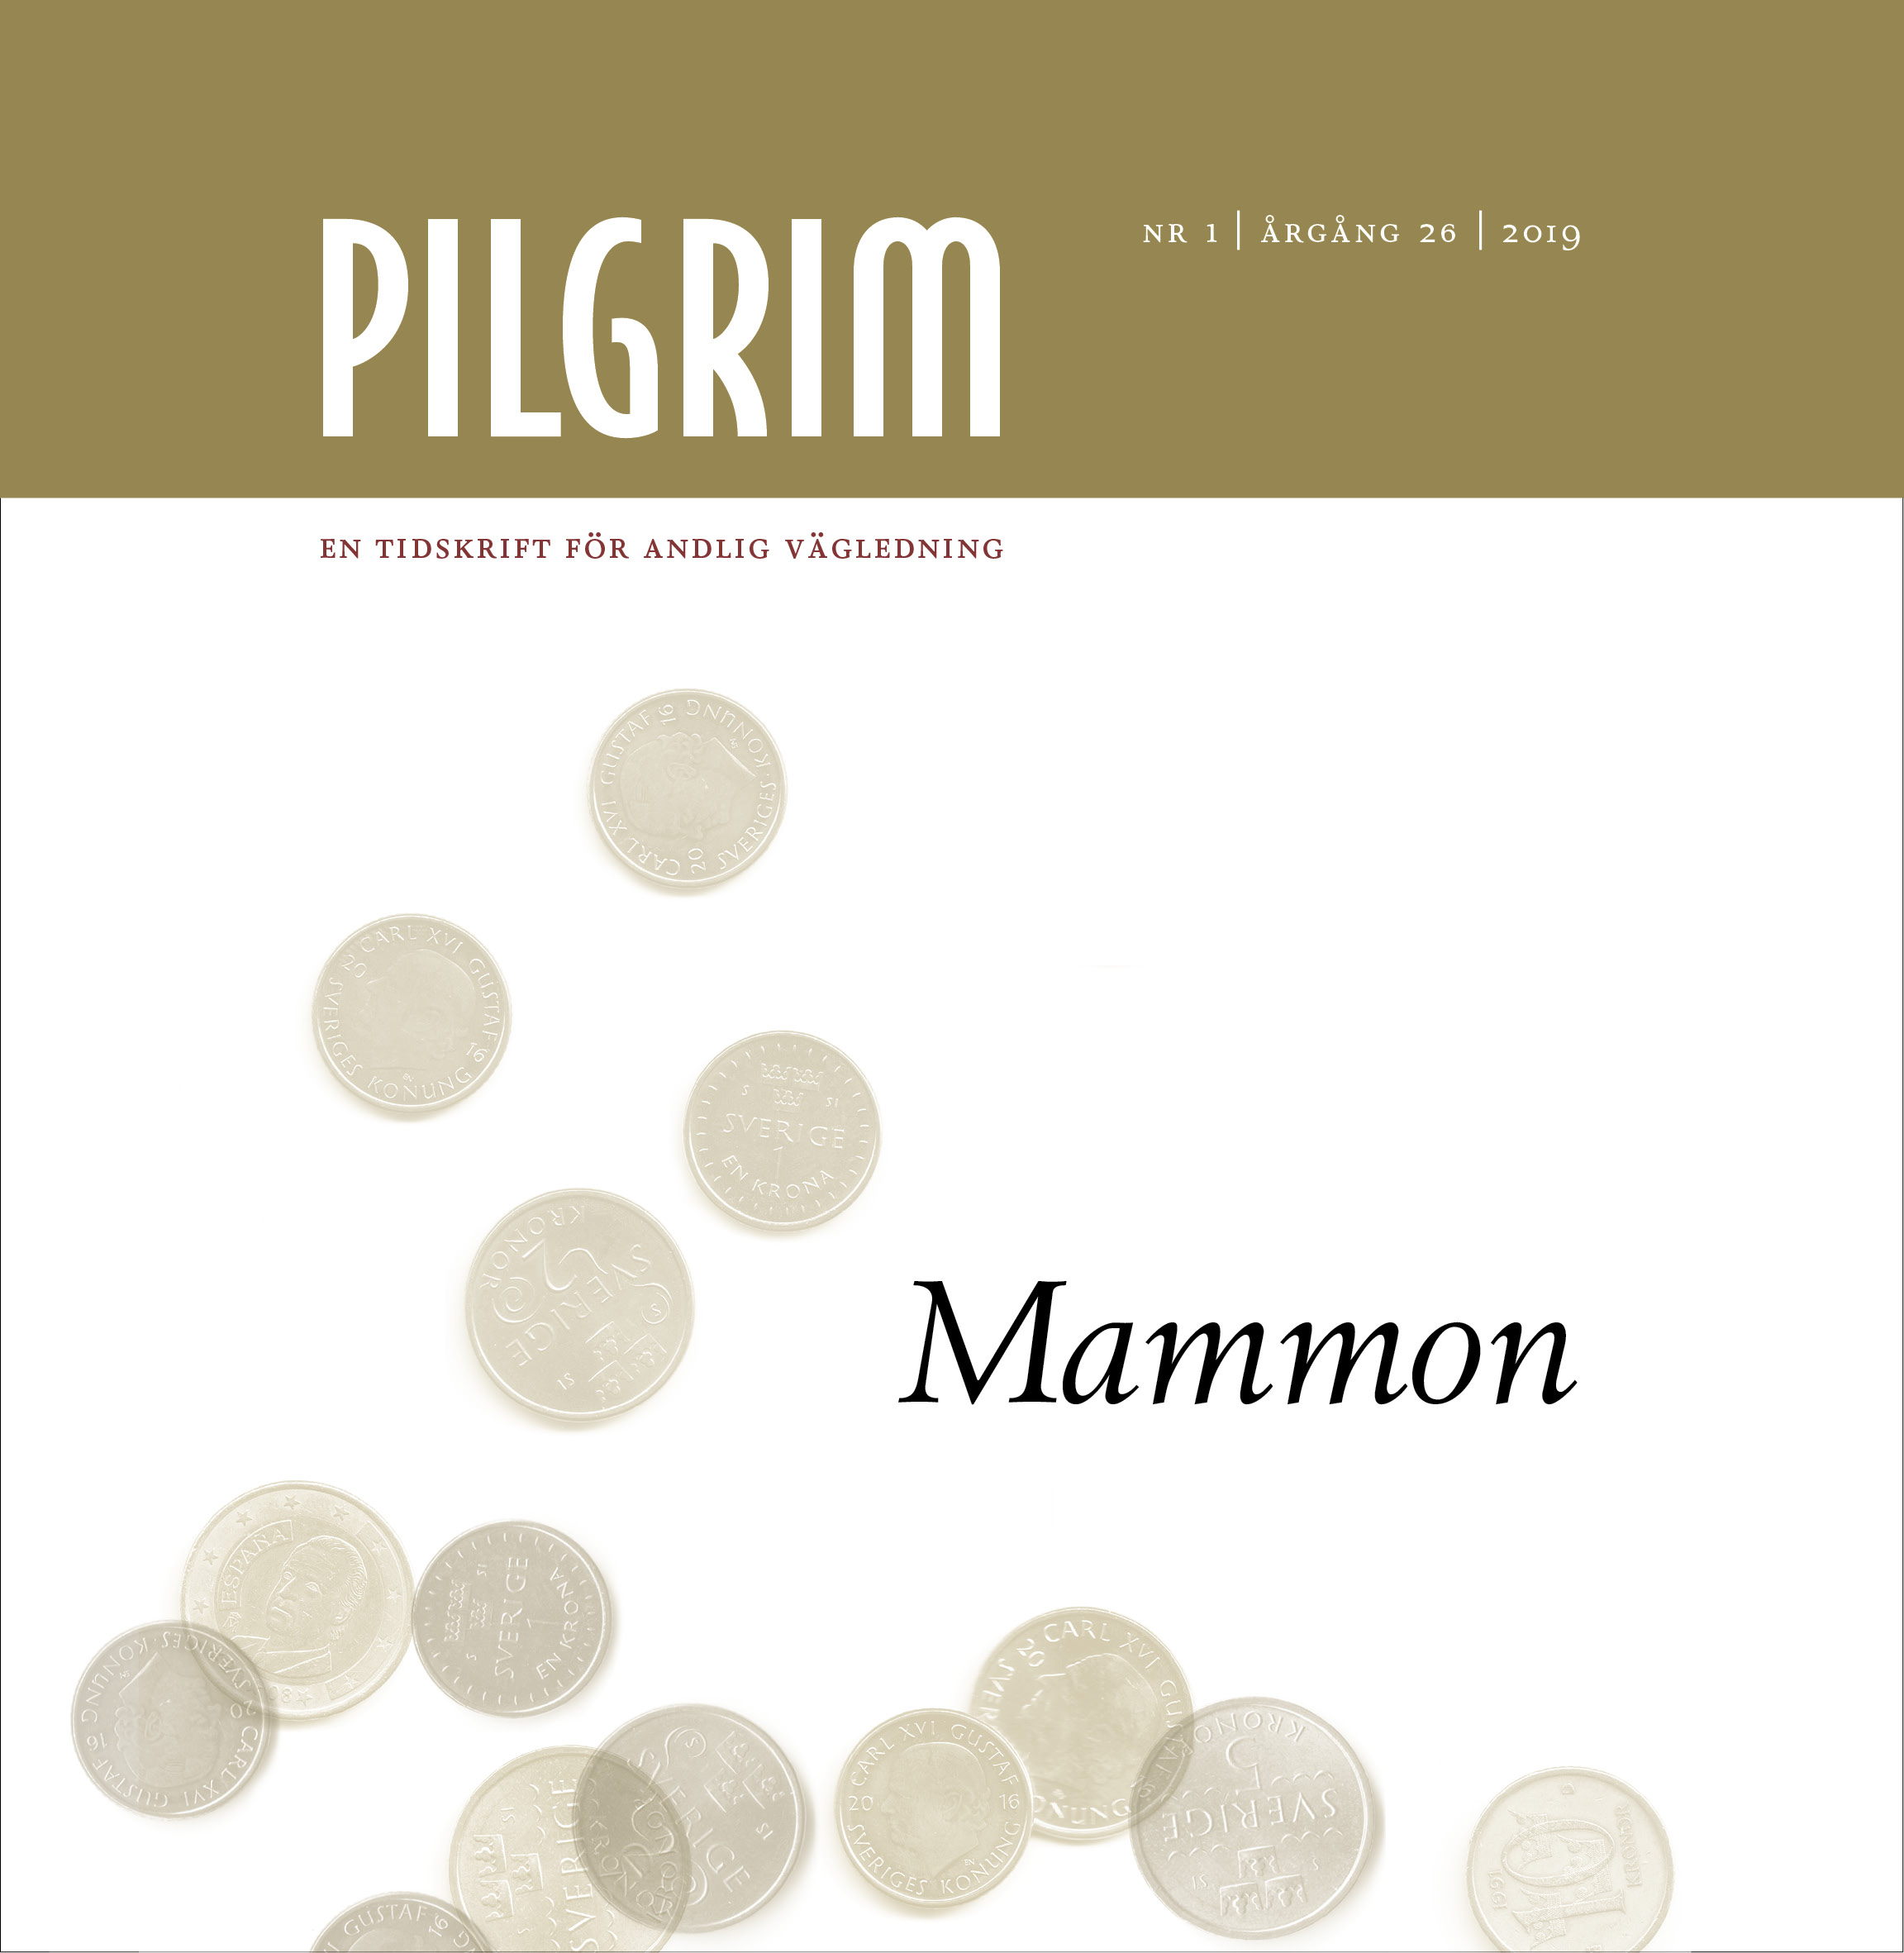 Pilgrim frams 2019-1